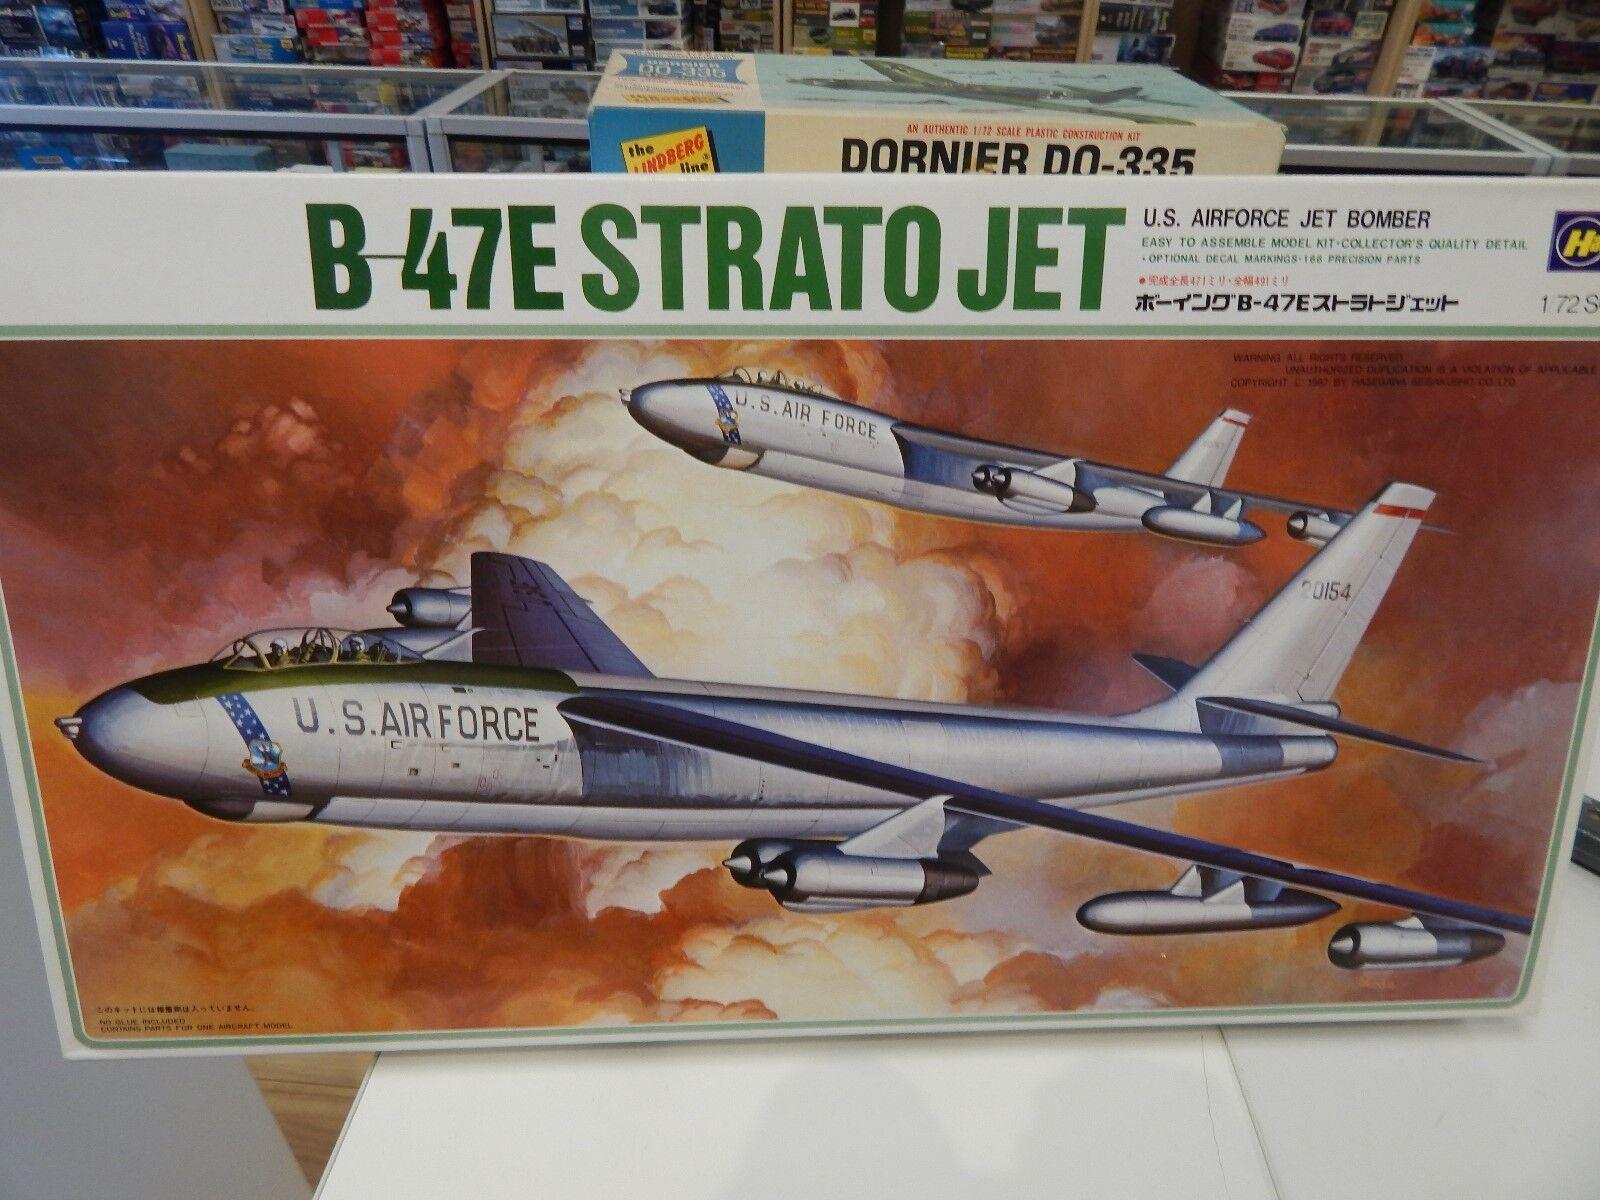 Hasegawa 1 72 SCALE PLASTIC CONSTRUCTION KIT B-47E Strato Jet